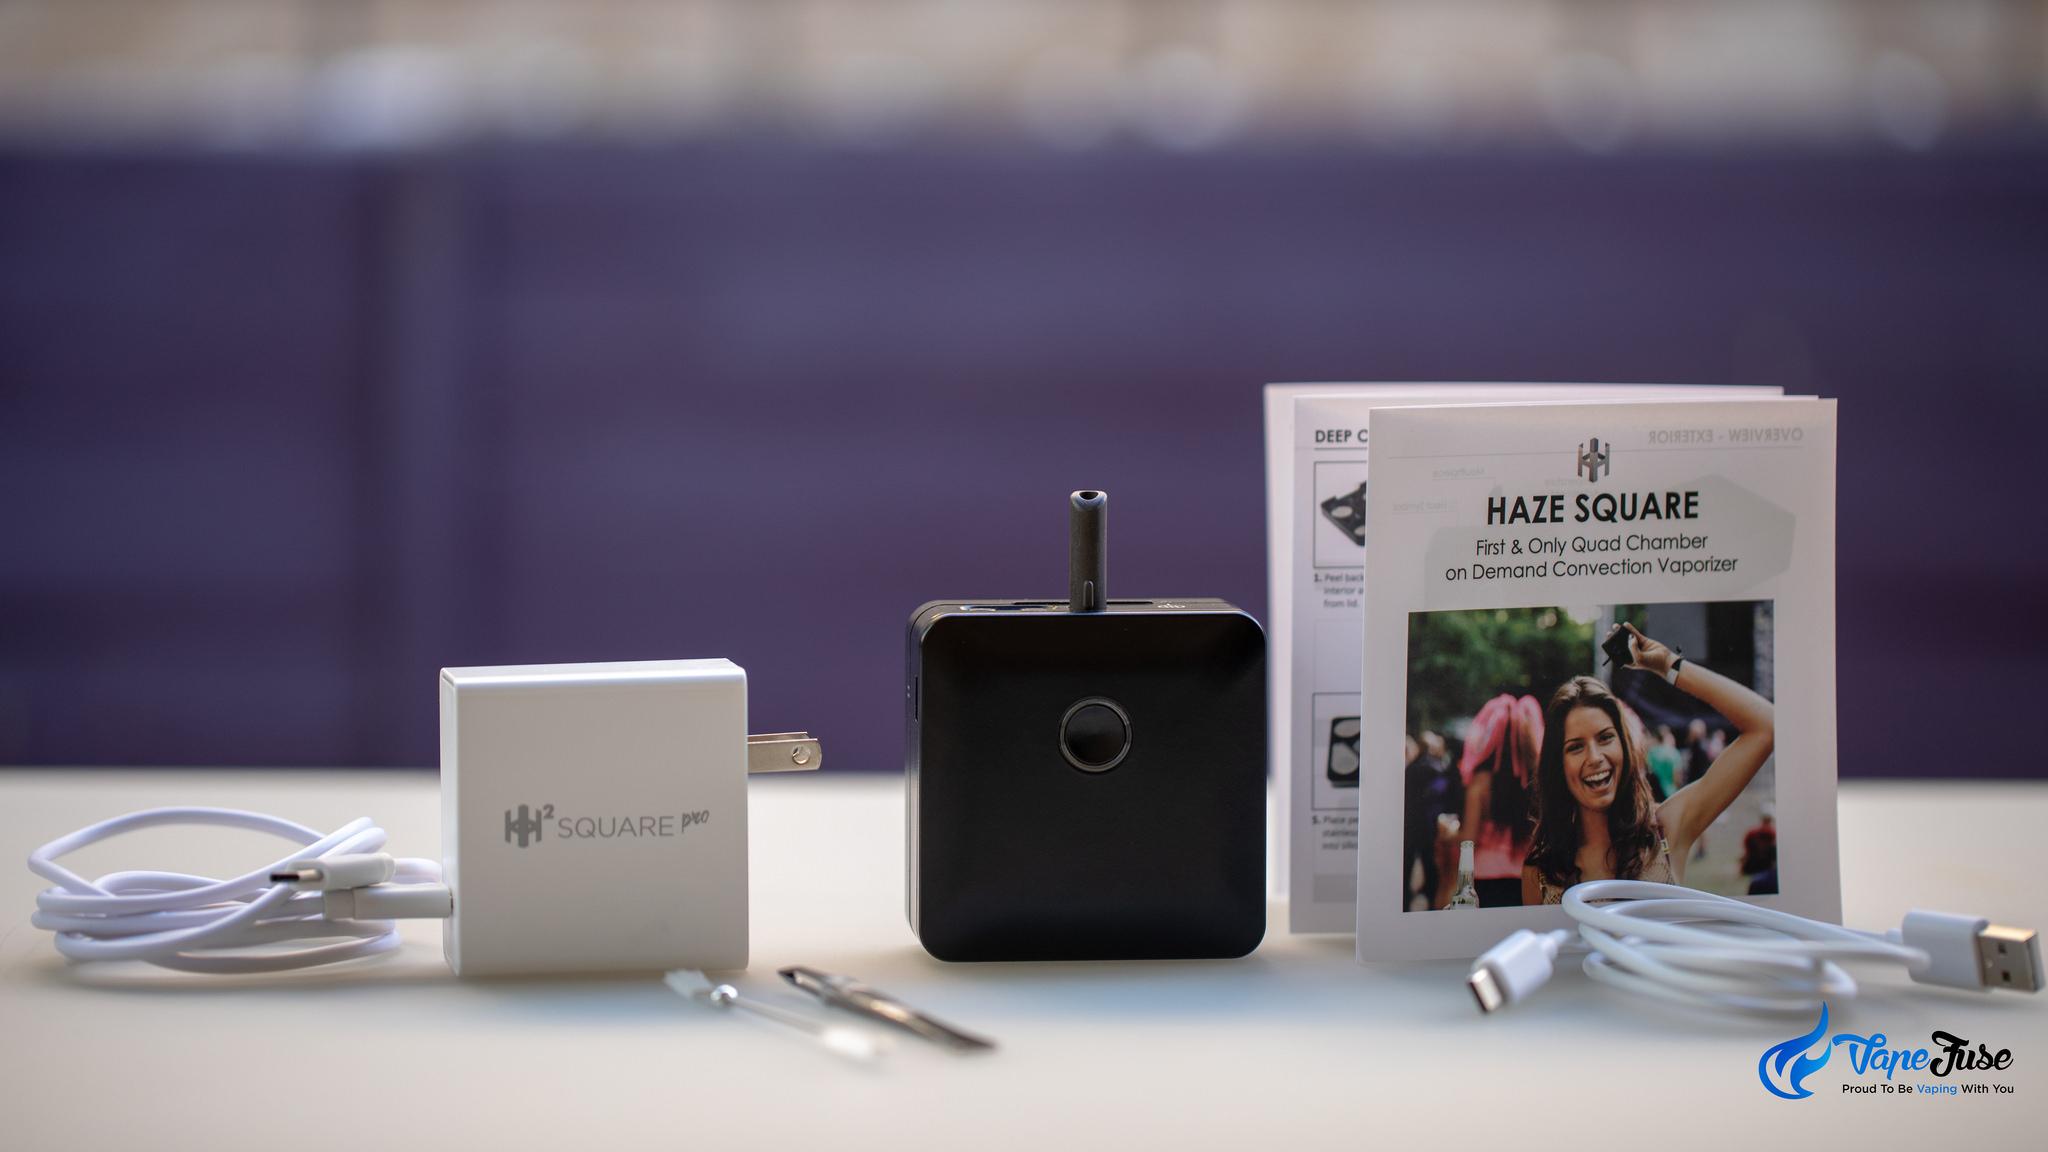 Haze Square Pro Portable Vaporizer: VapeFuse First Look